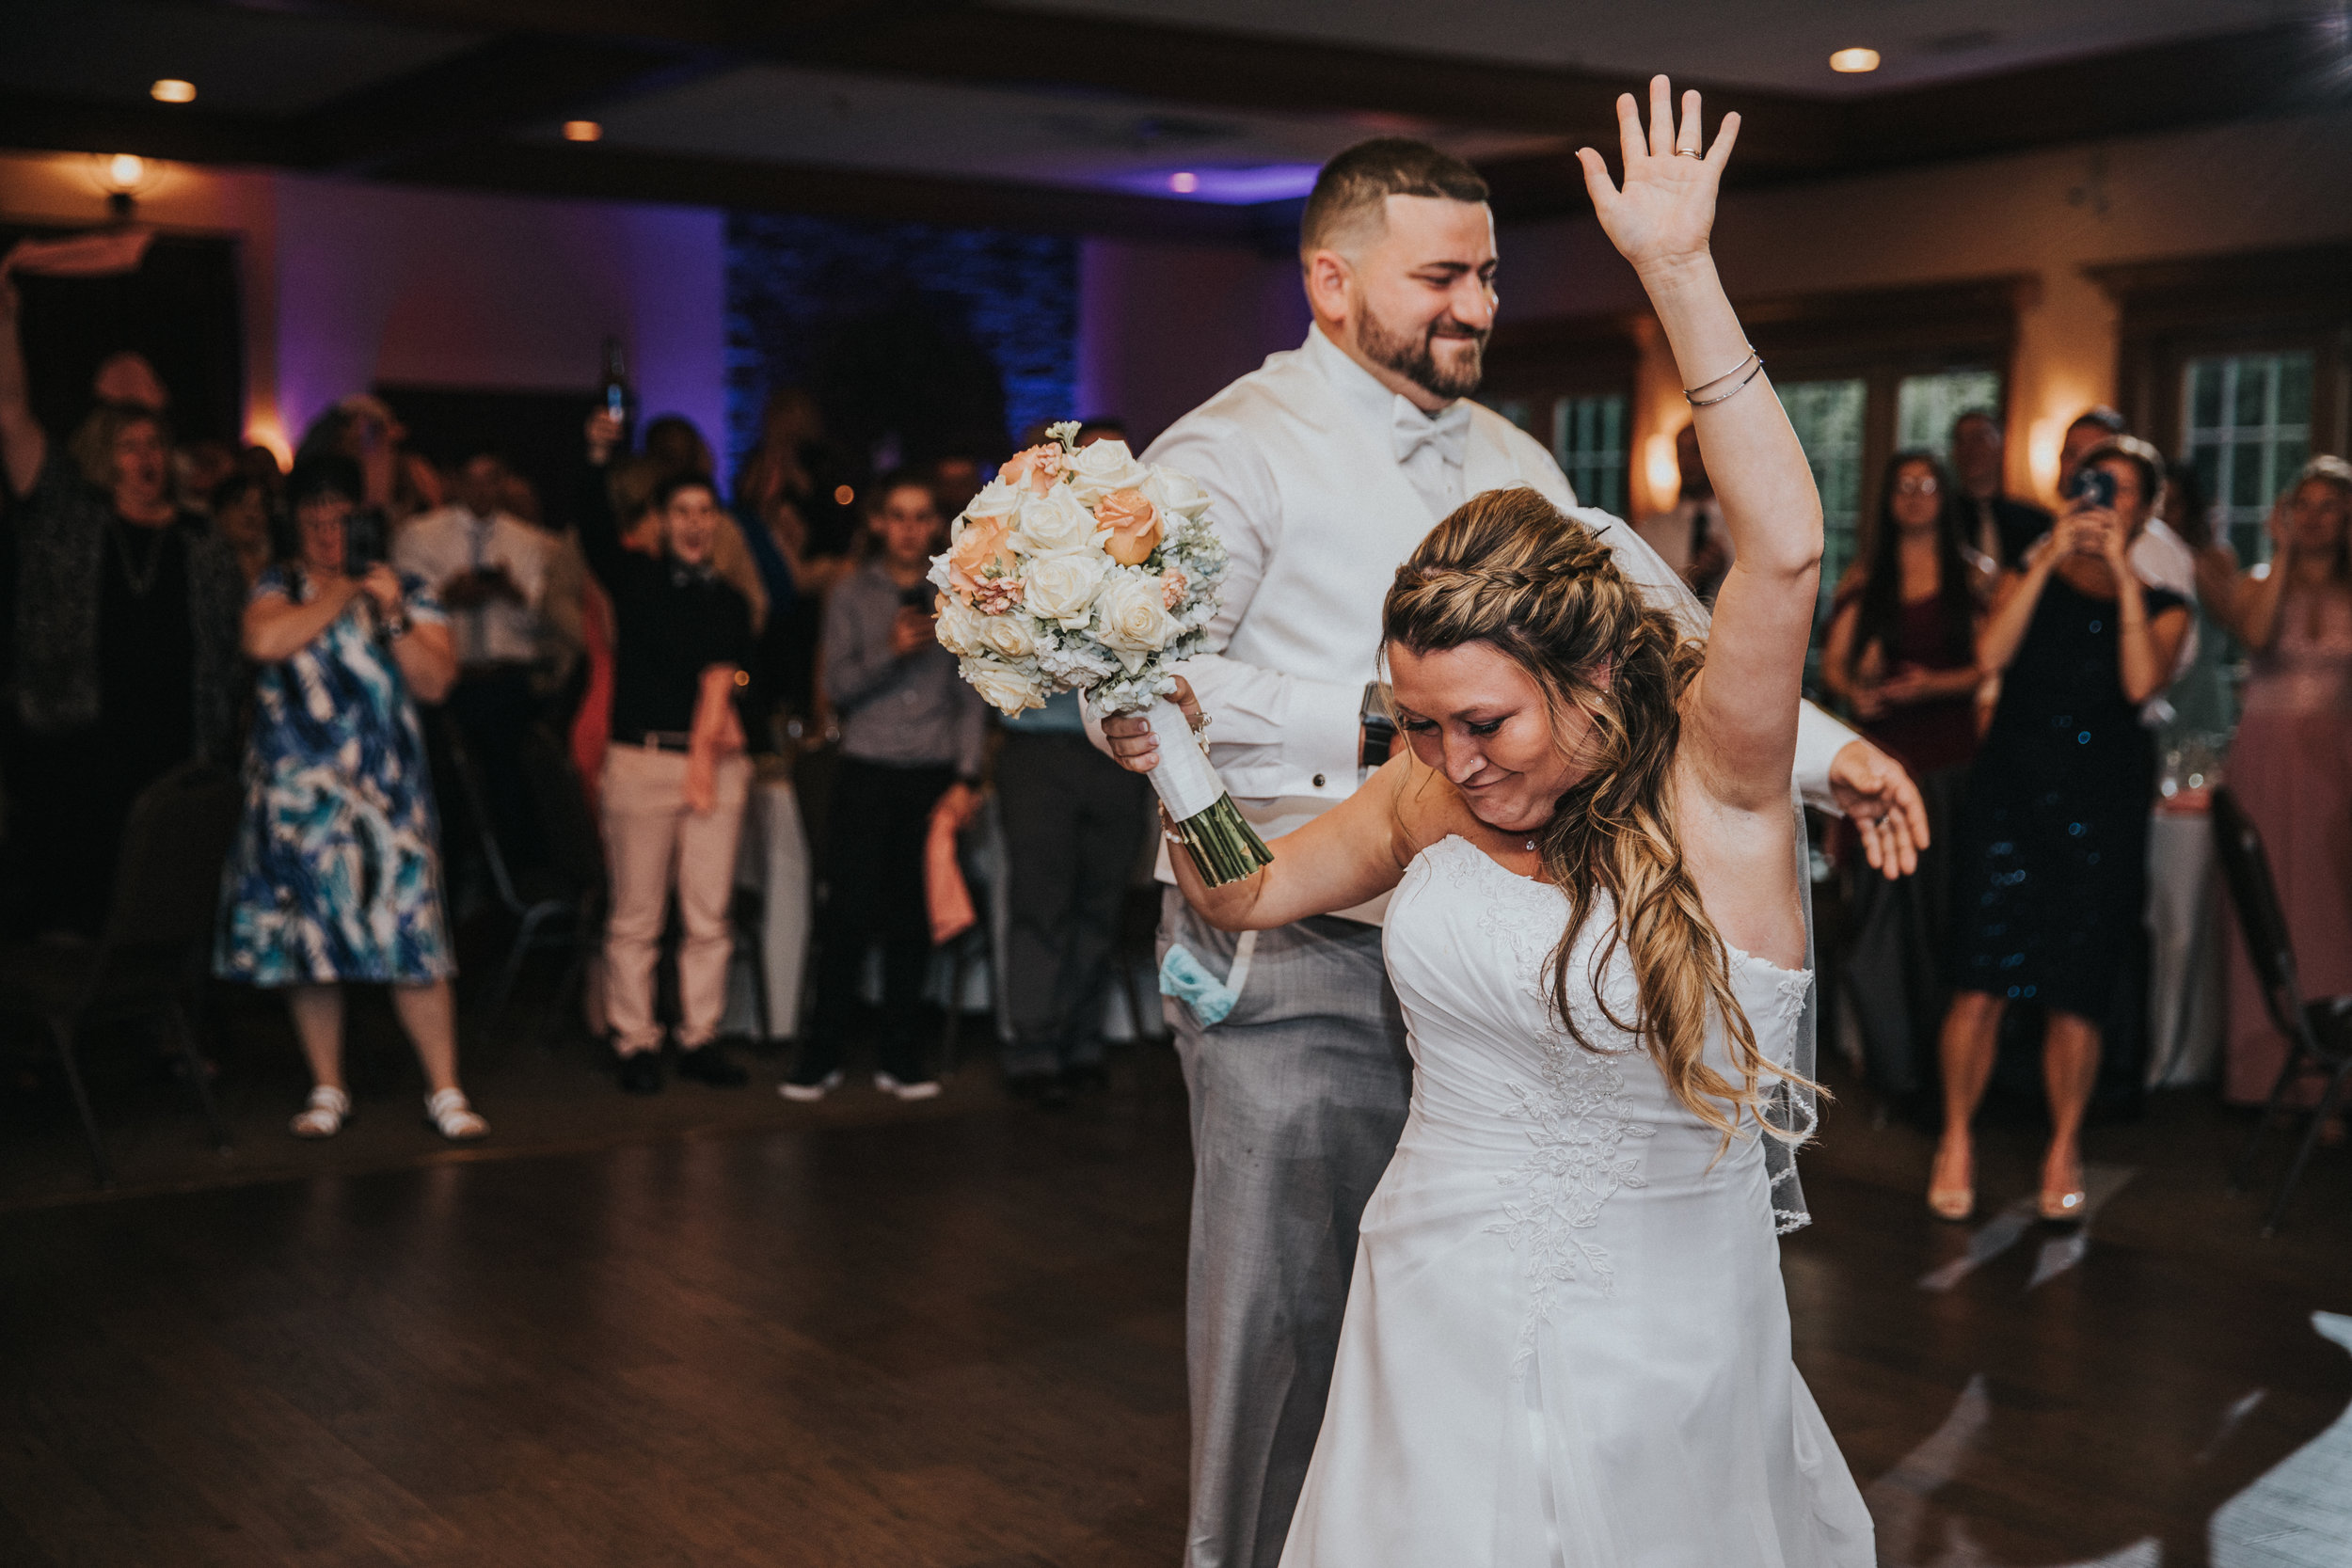 New-Jersey-Wedding-Photographer-JennaLynnPhotography-ValenzanoWinery-Reception-40.jpg